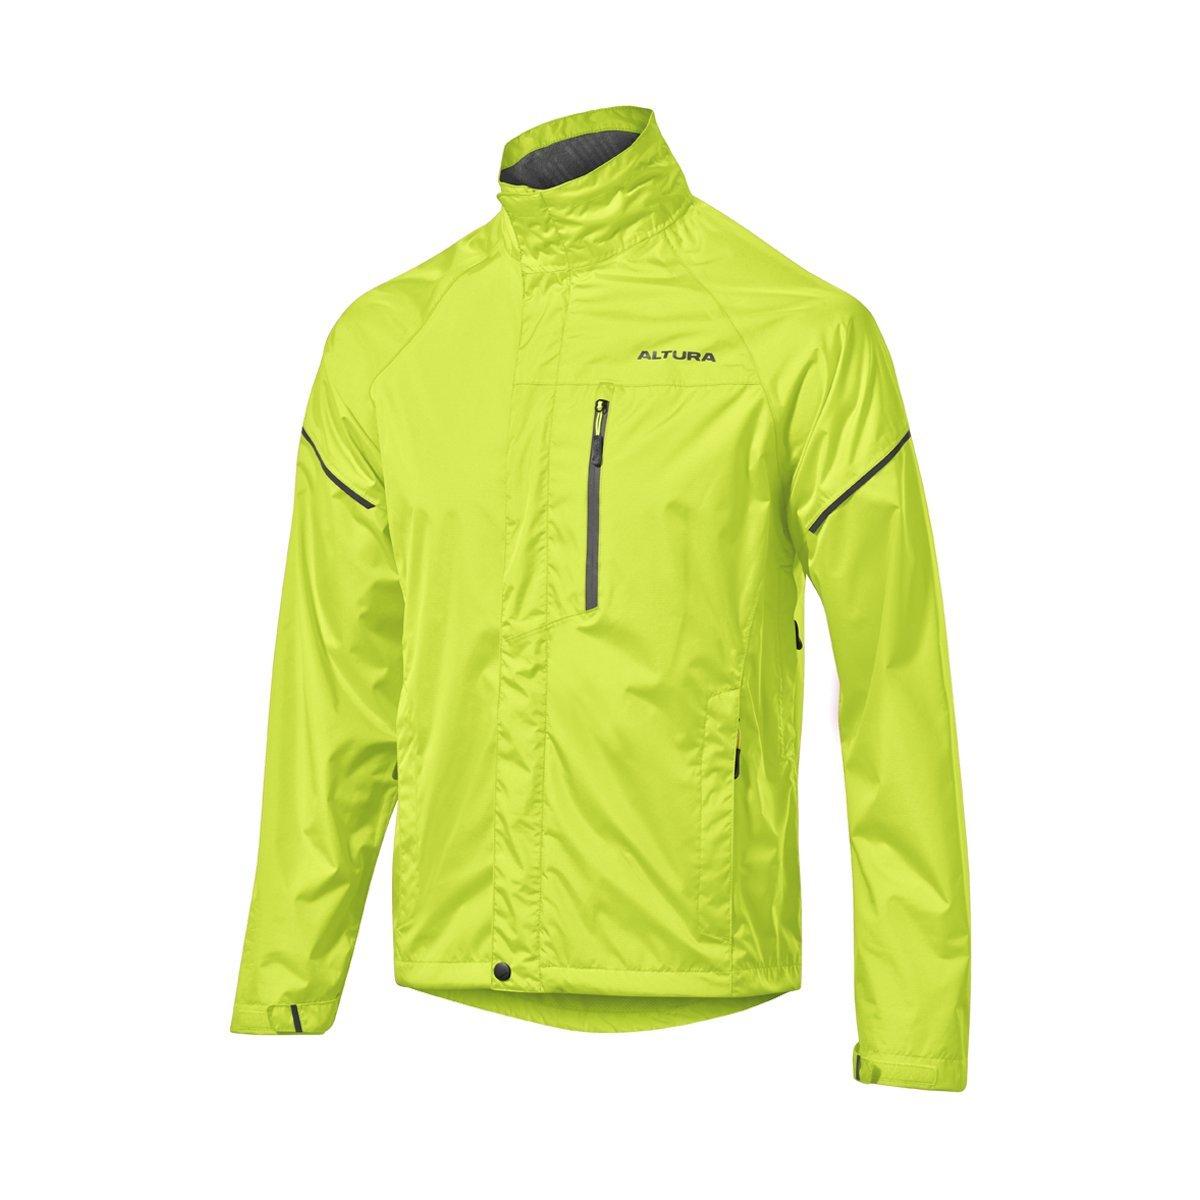 Altura Men s Nevis III (3) Waterproof Jacket  Altura  Amazon.co.uk  Sports    Outdoors e0d497651